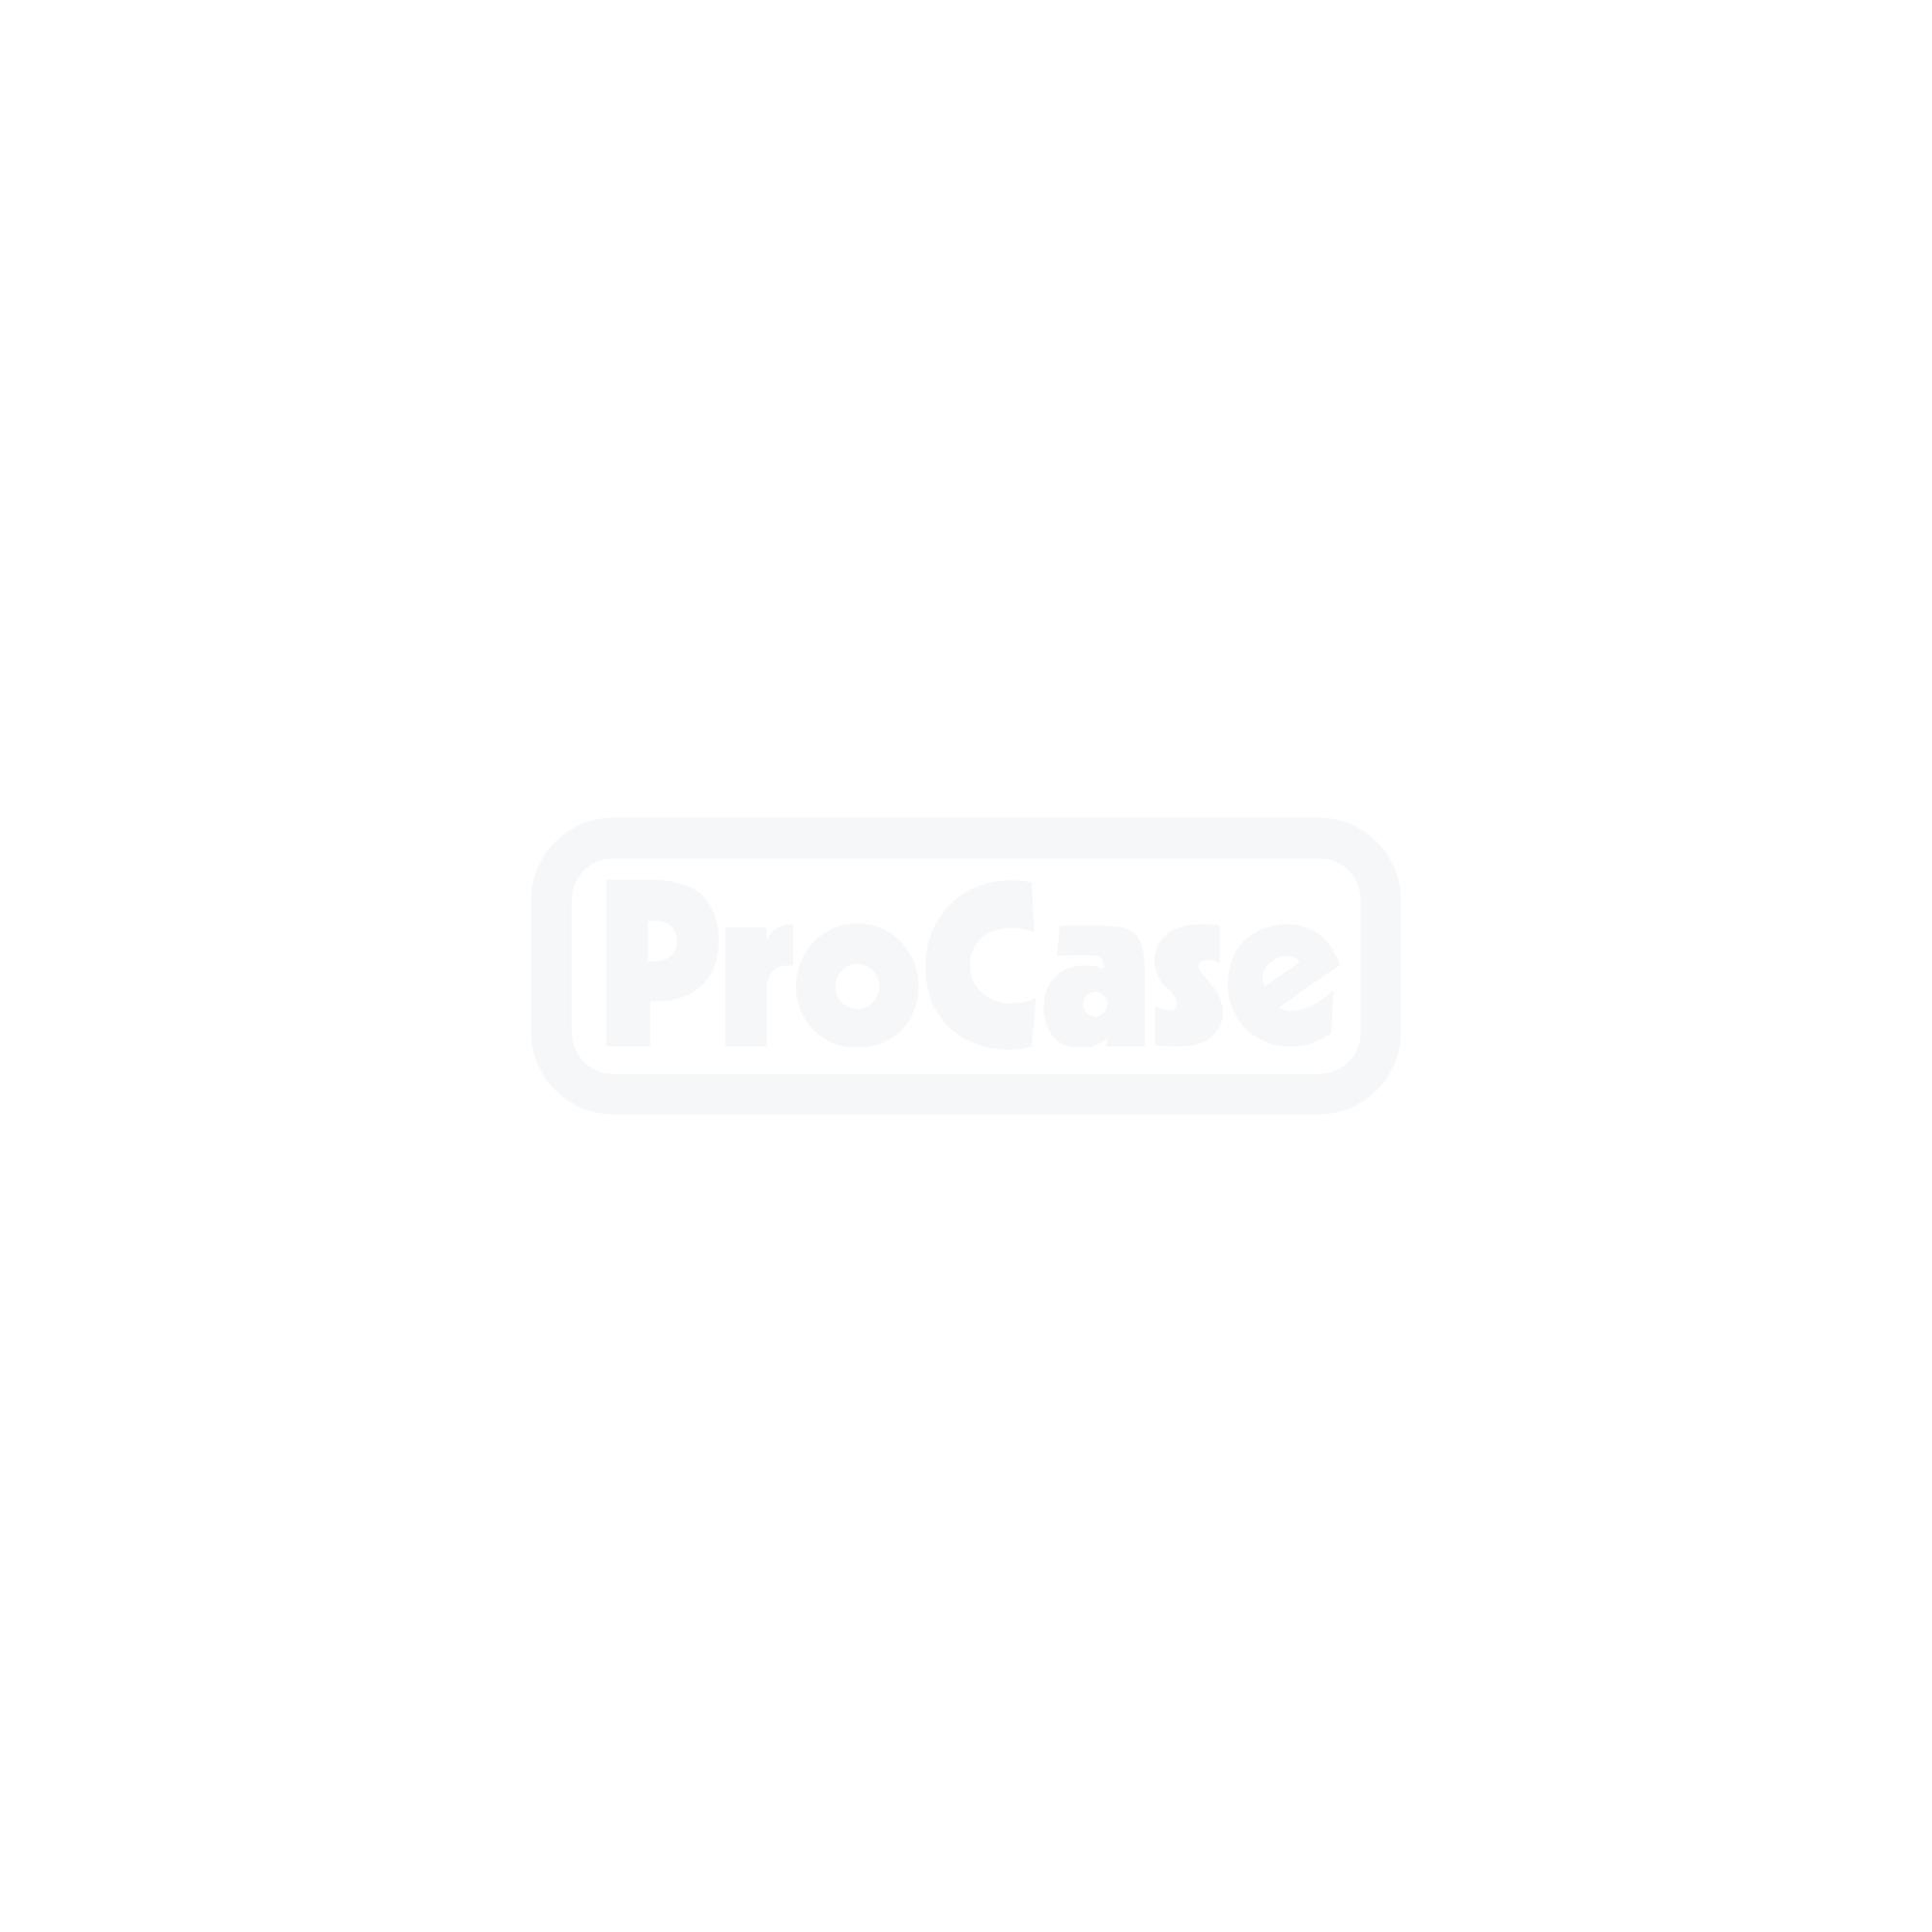 SKB 3i Koffer 0806-3B mit Rasterschaumstoff